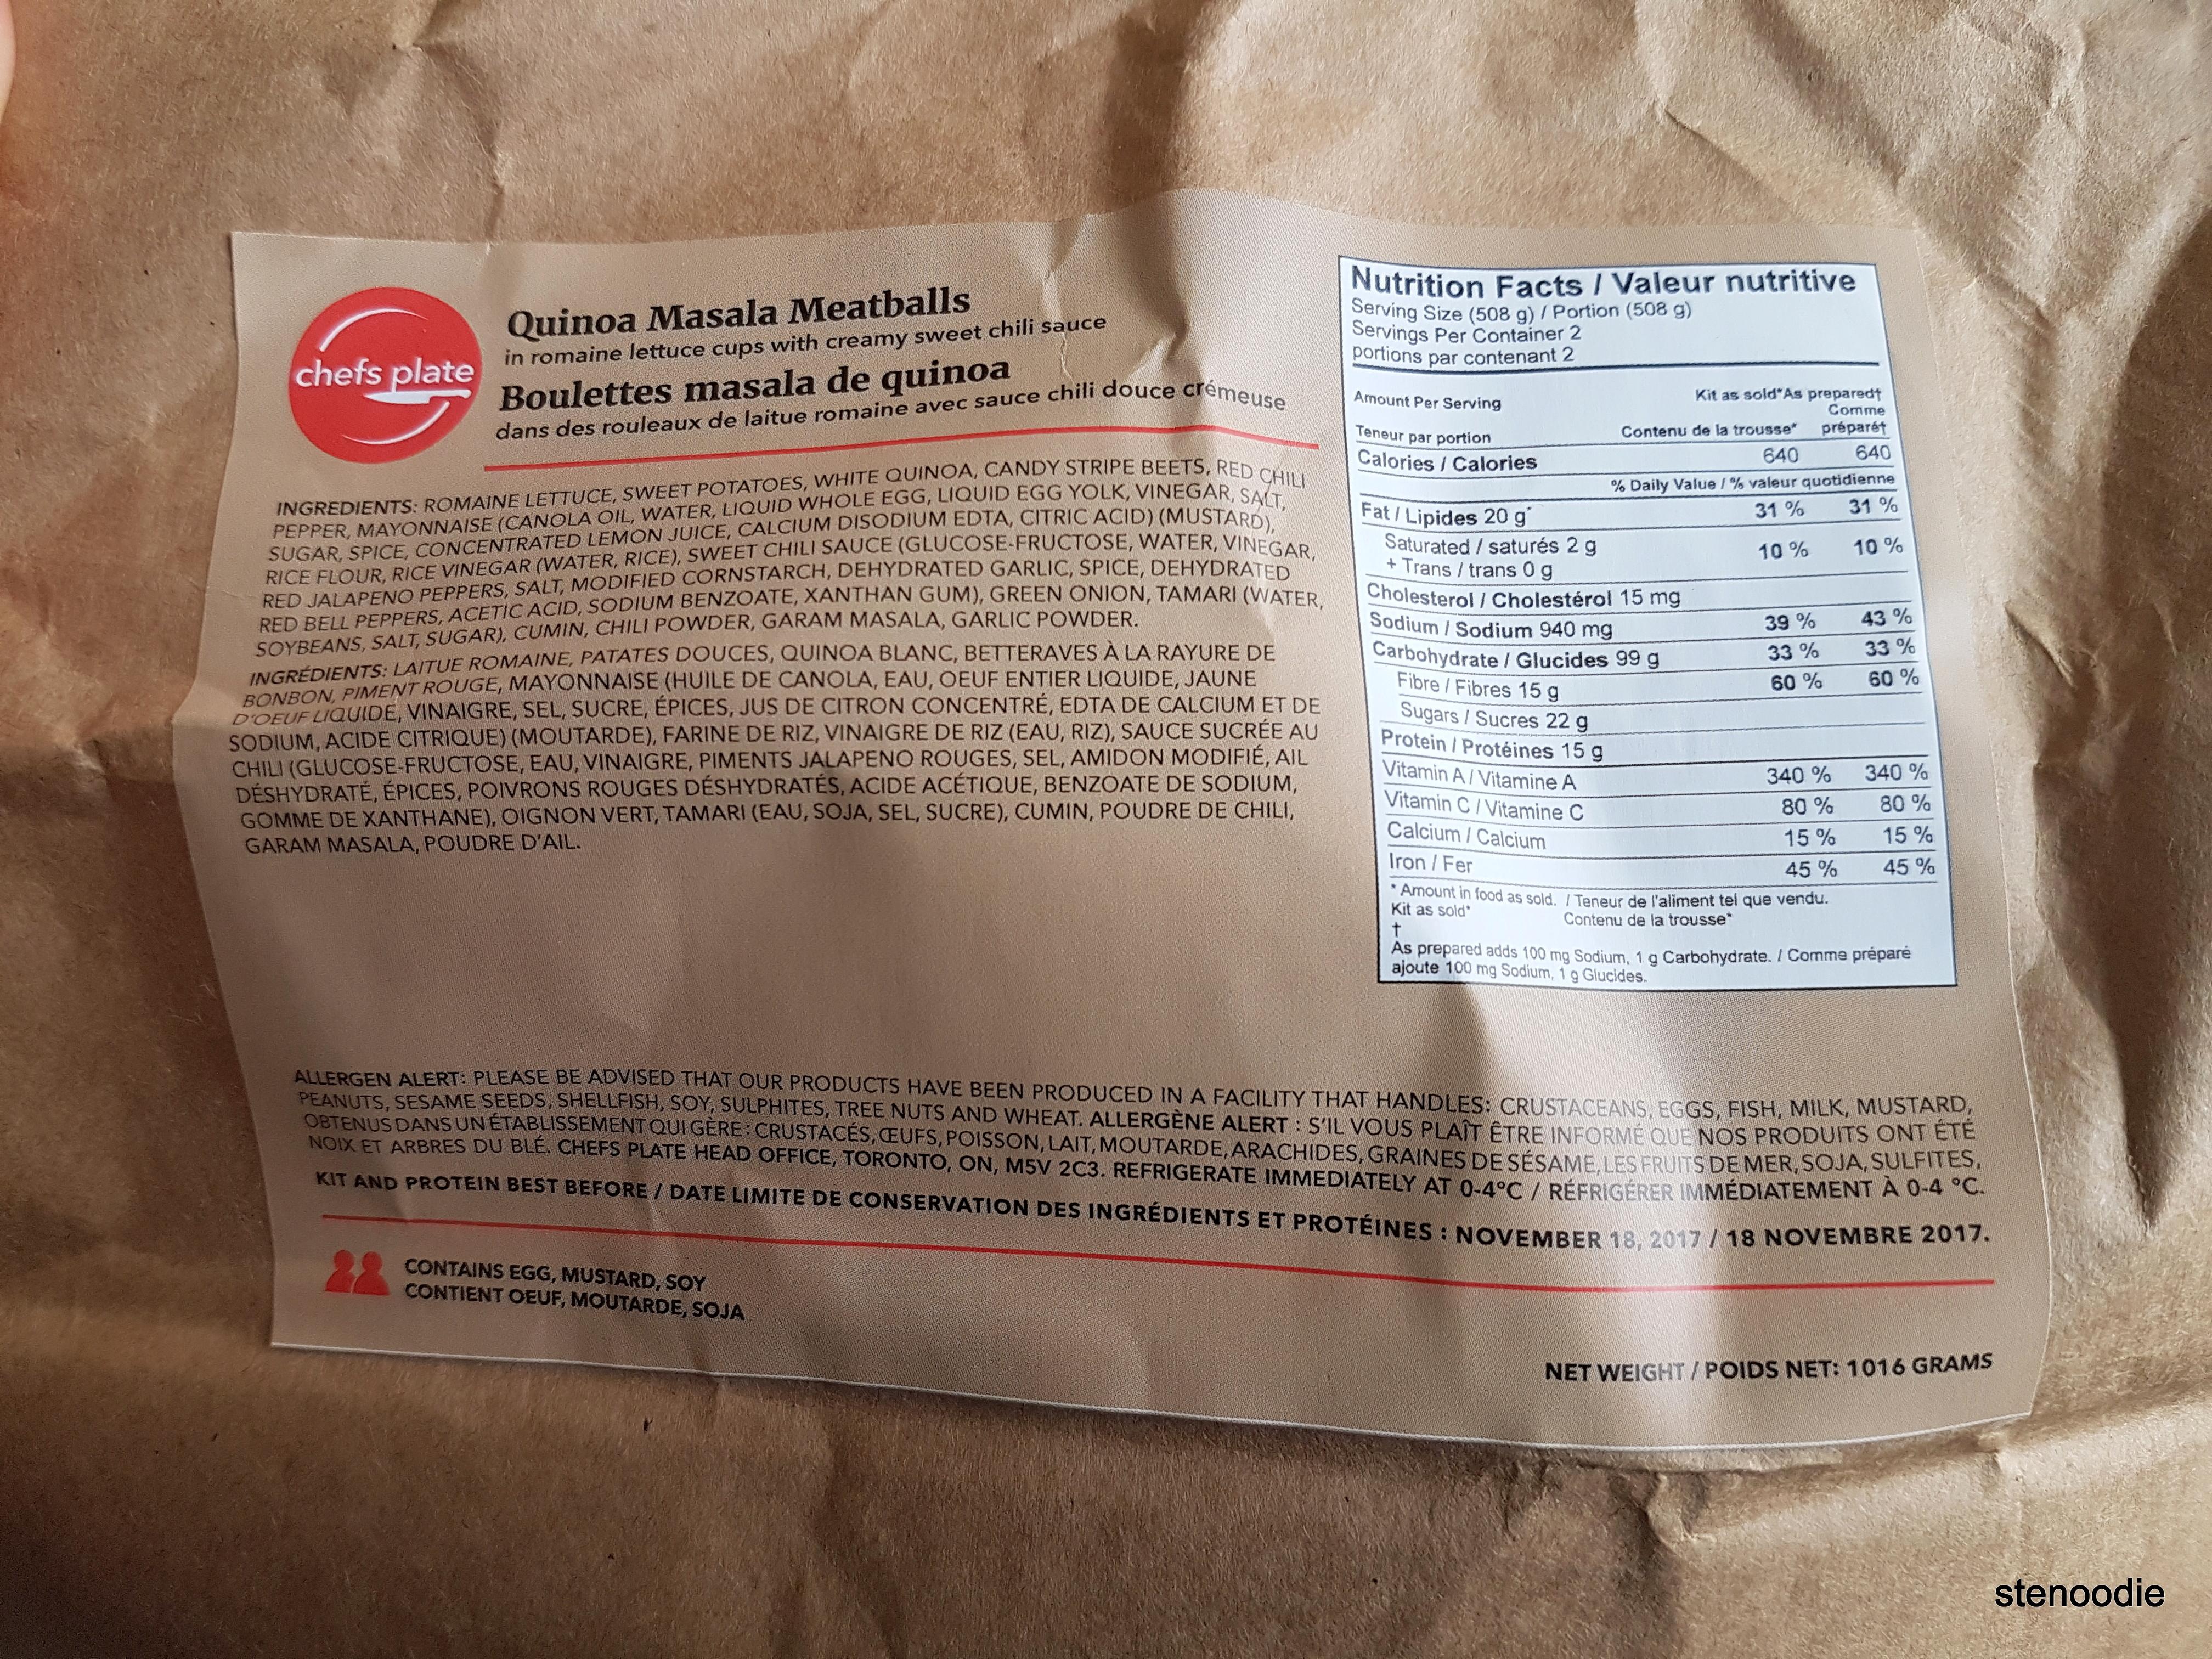 Quinoa Masala Meatballs nutrition information